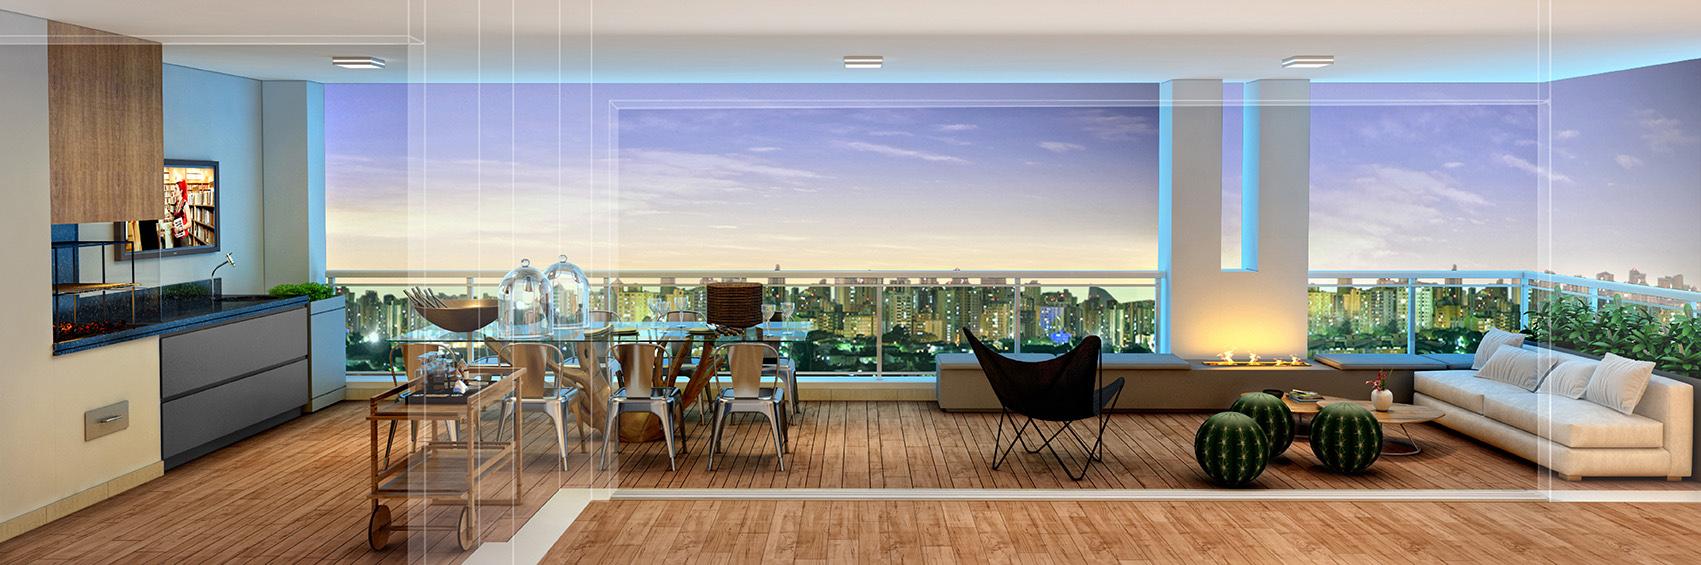 Terraço - 197 m²